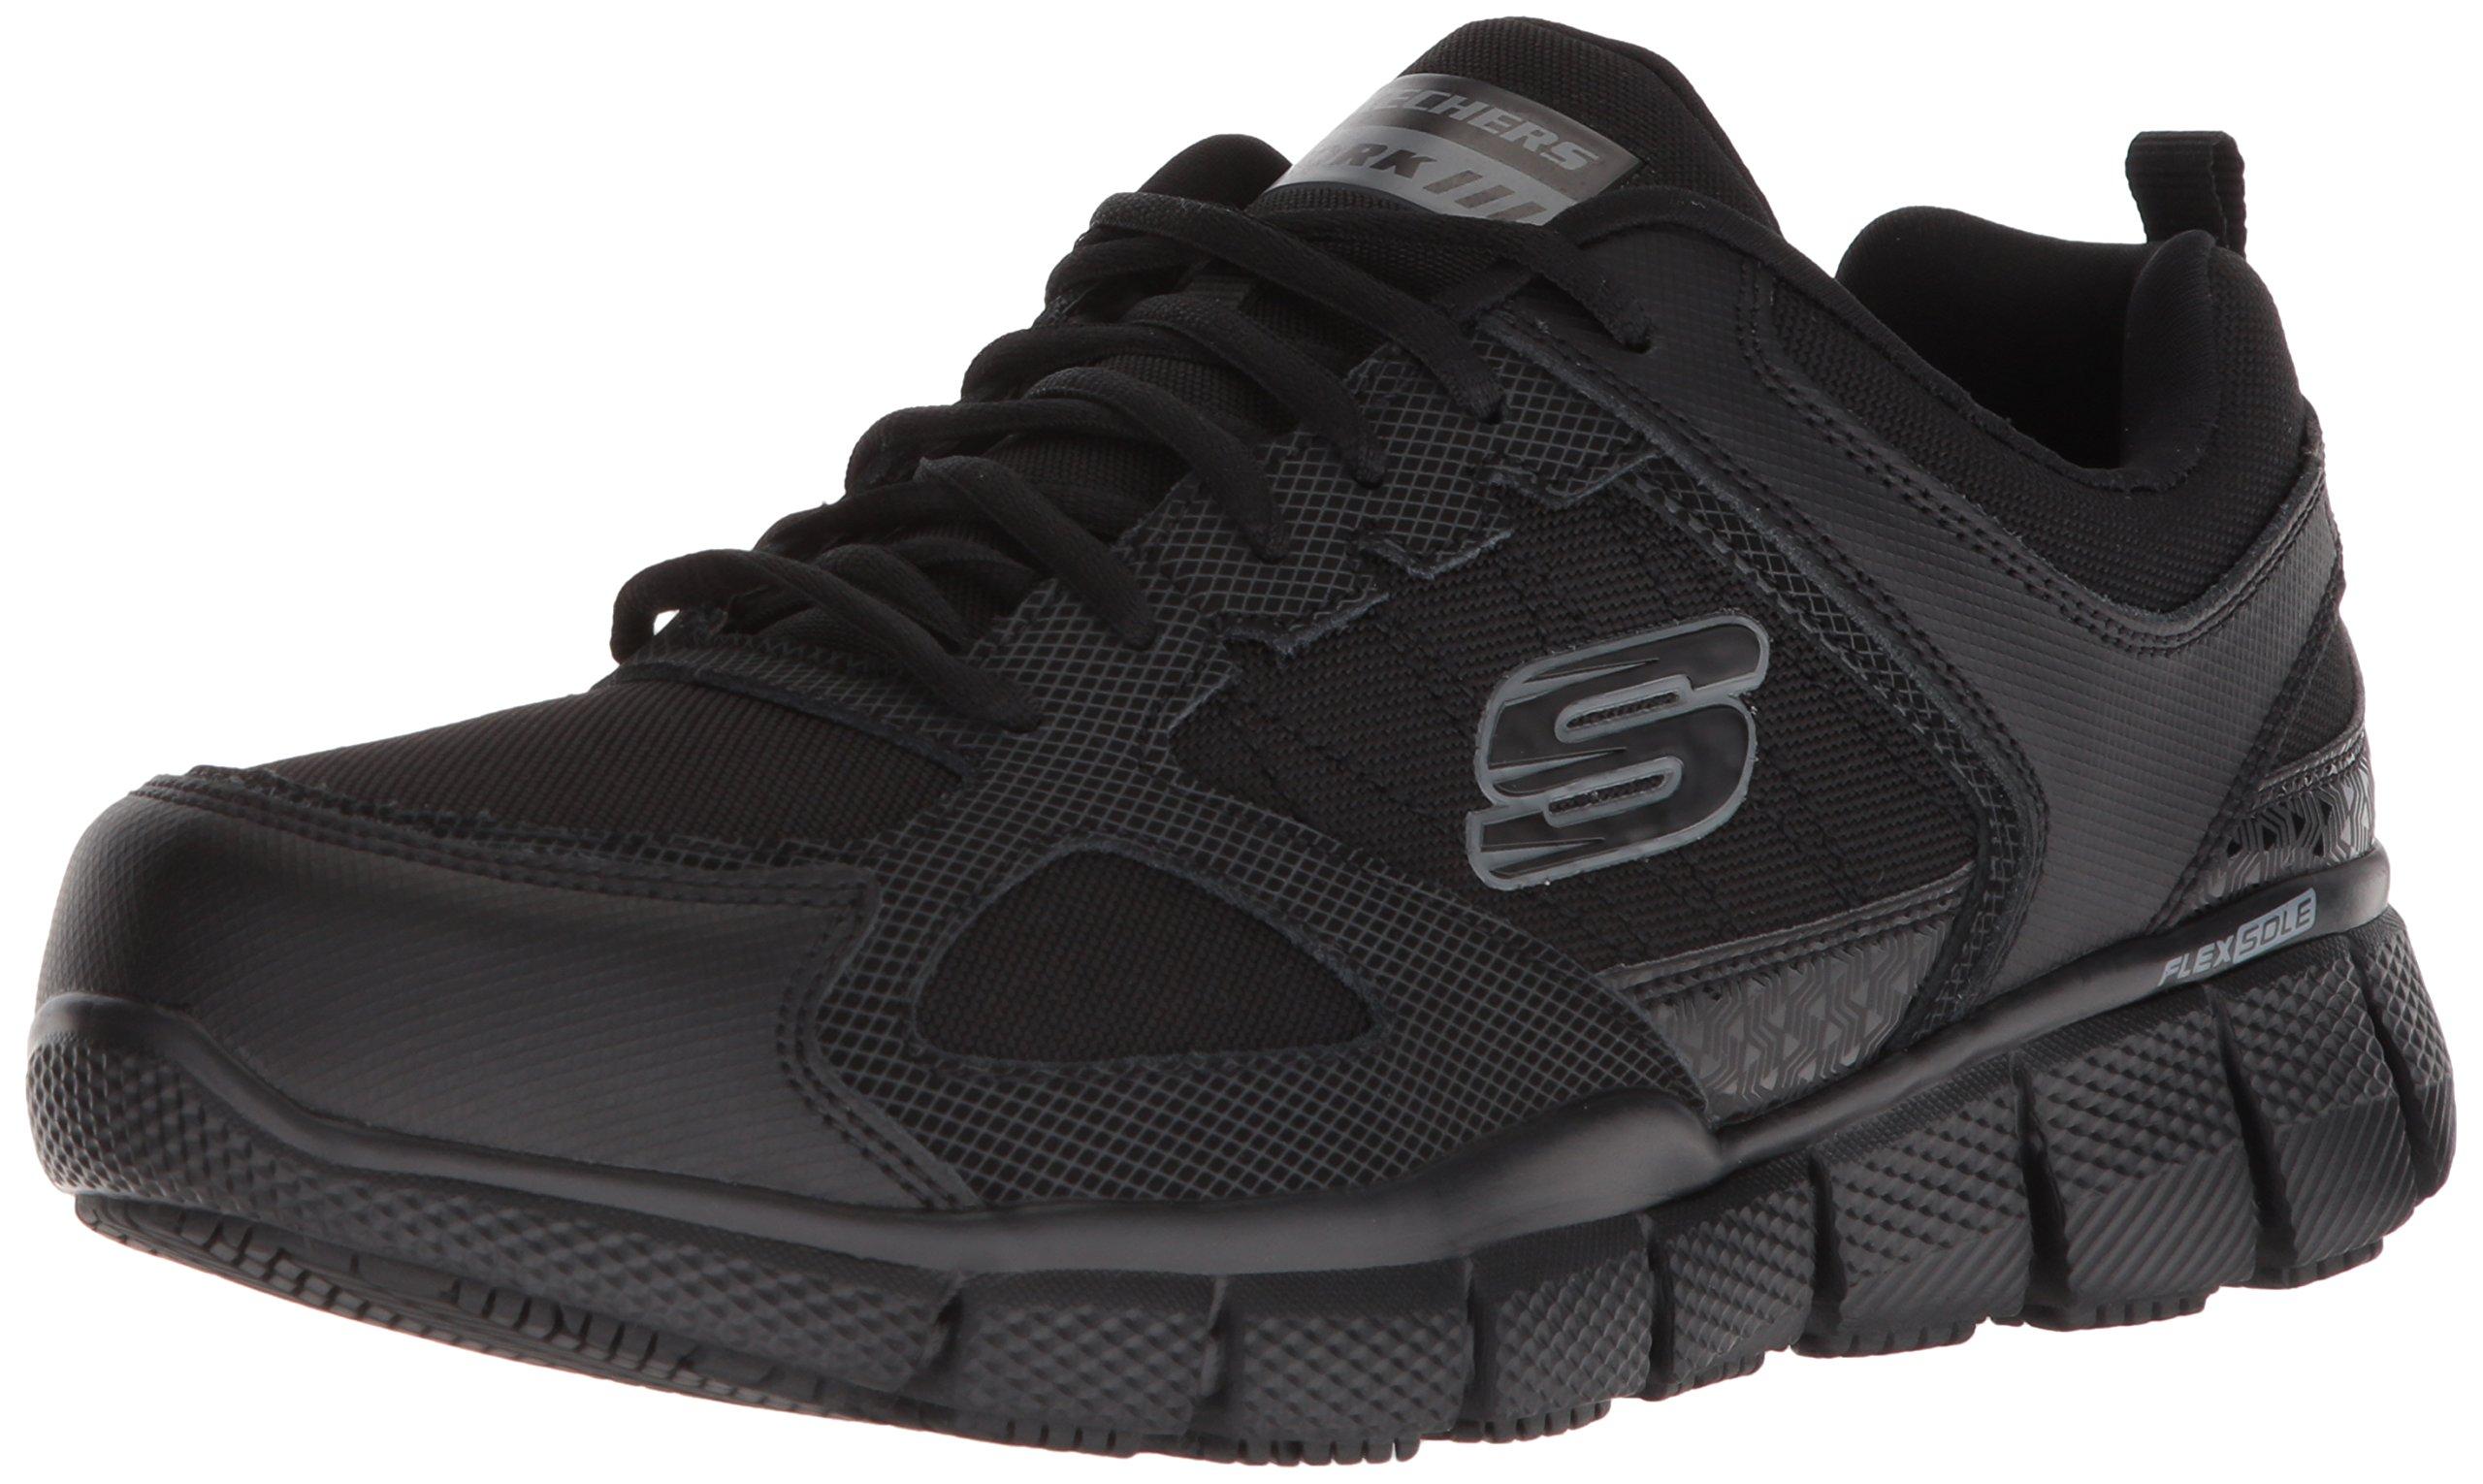 Skechers Work Men's Telfin-Sanphet Industrial Shoe, Black Leather Courdura, 10 M US